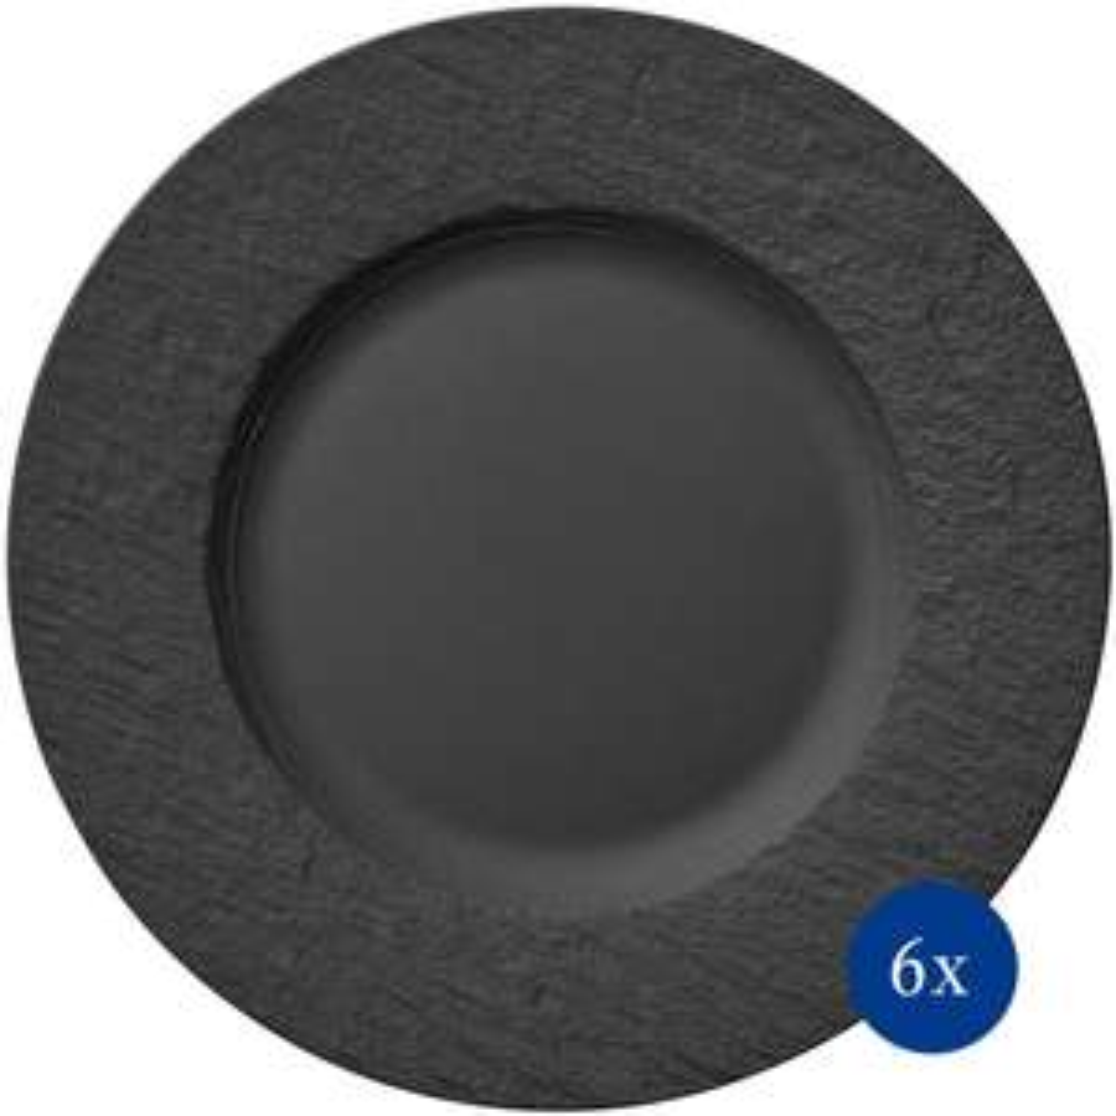 Villeroy & Boch 6-teiliges Speiseteller-Set Manufacture Rock (Porzellan, 27 cm) [DEALCLUB]